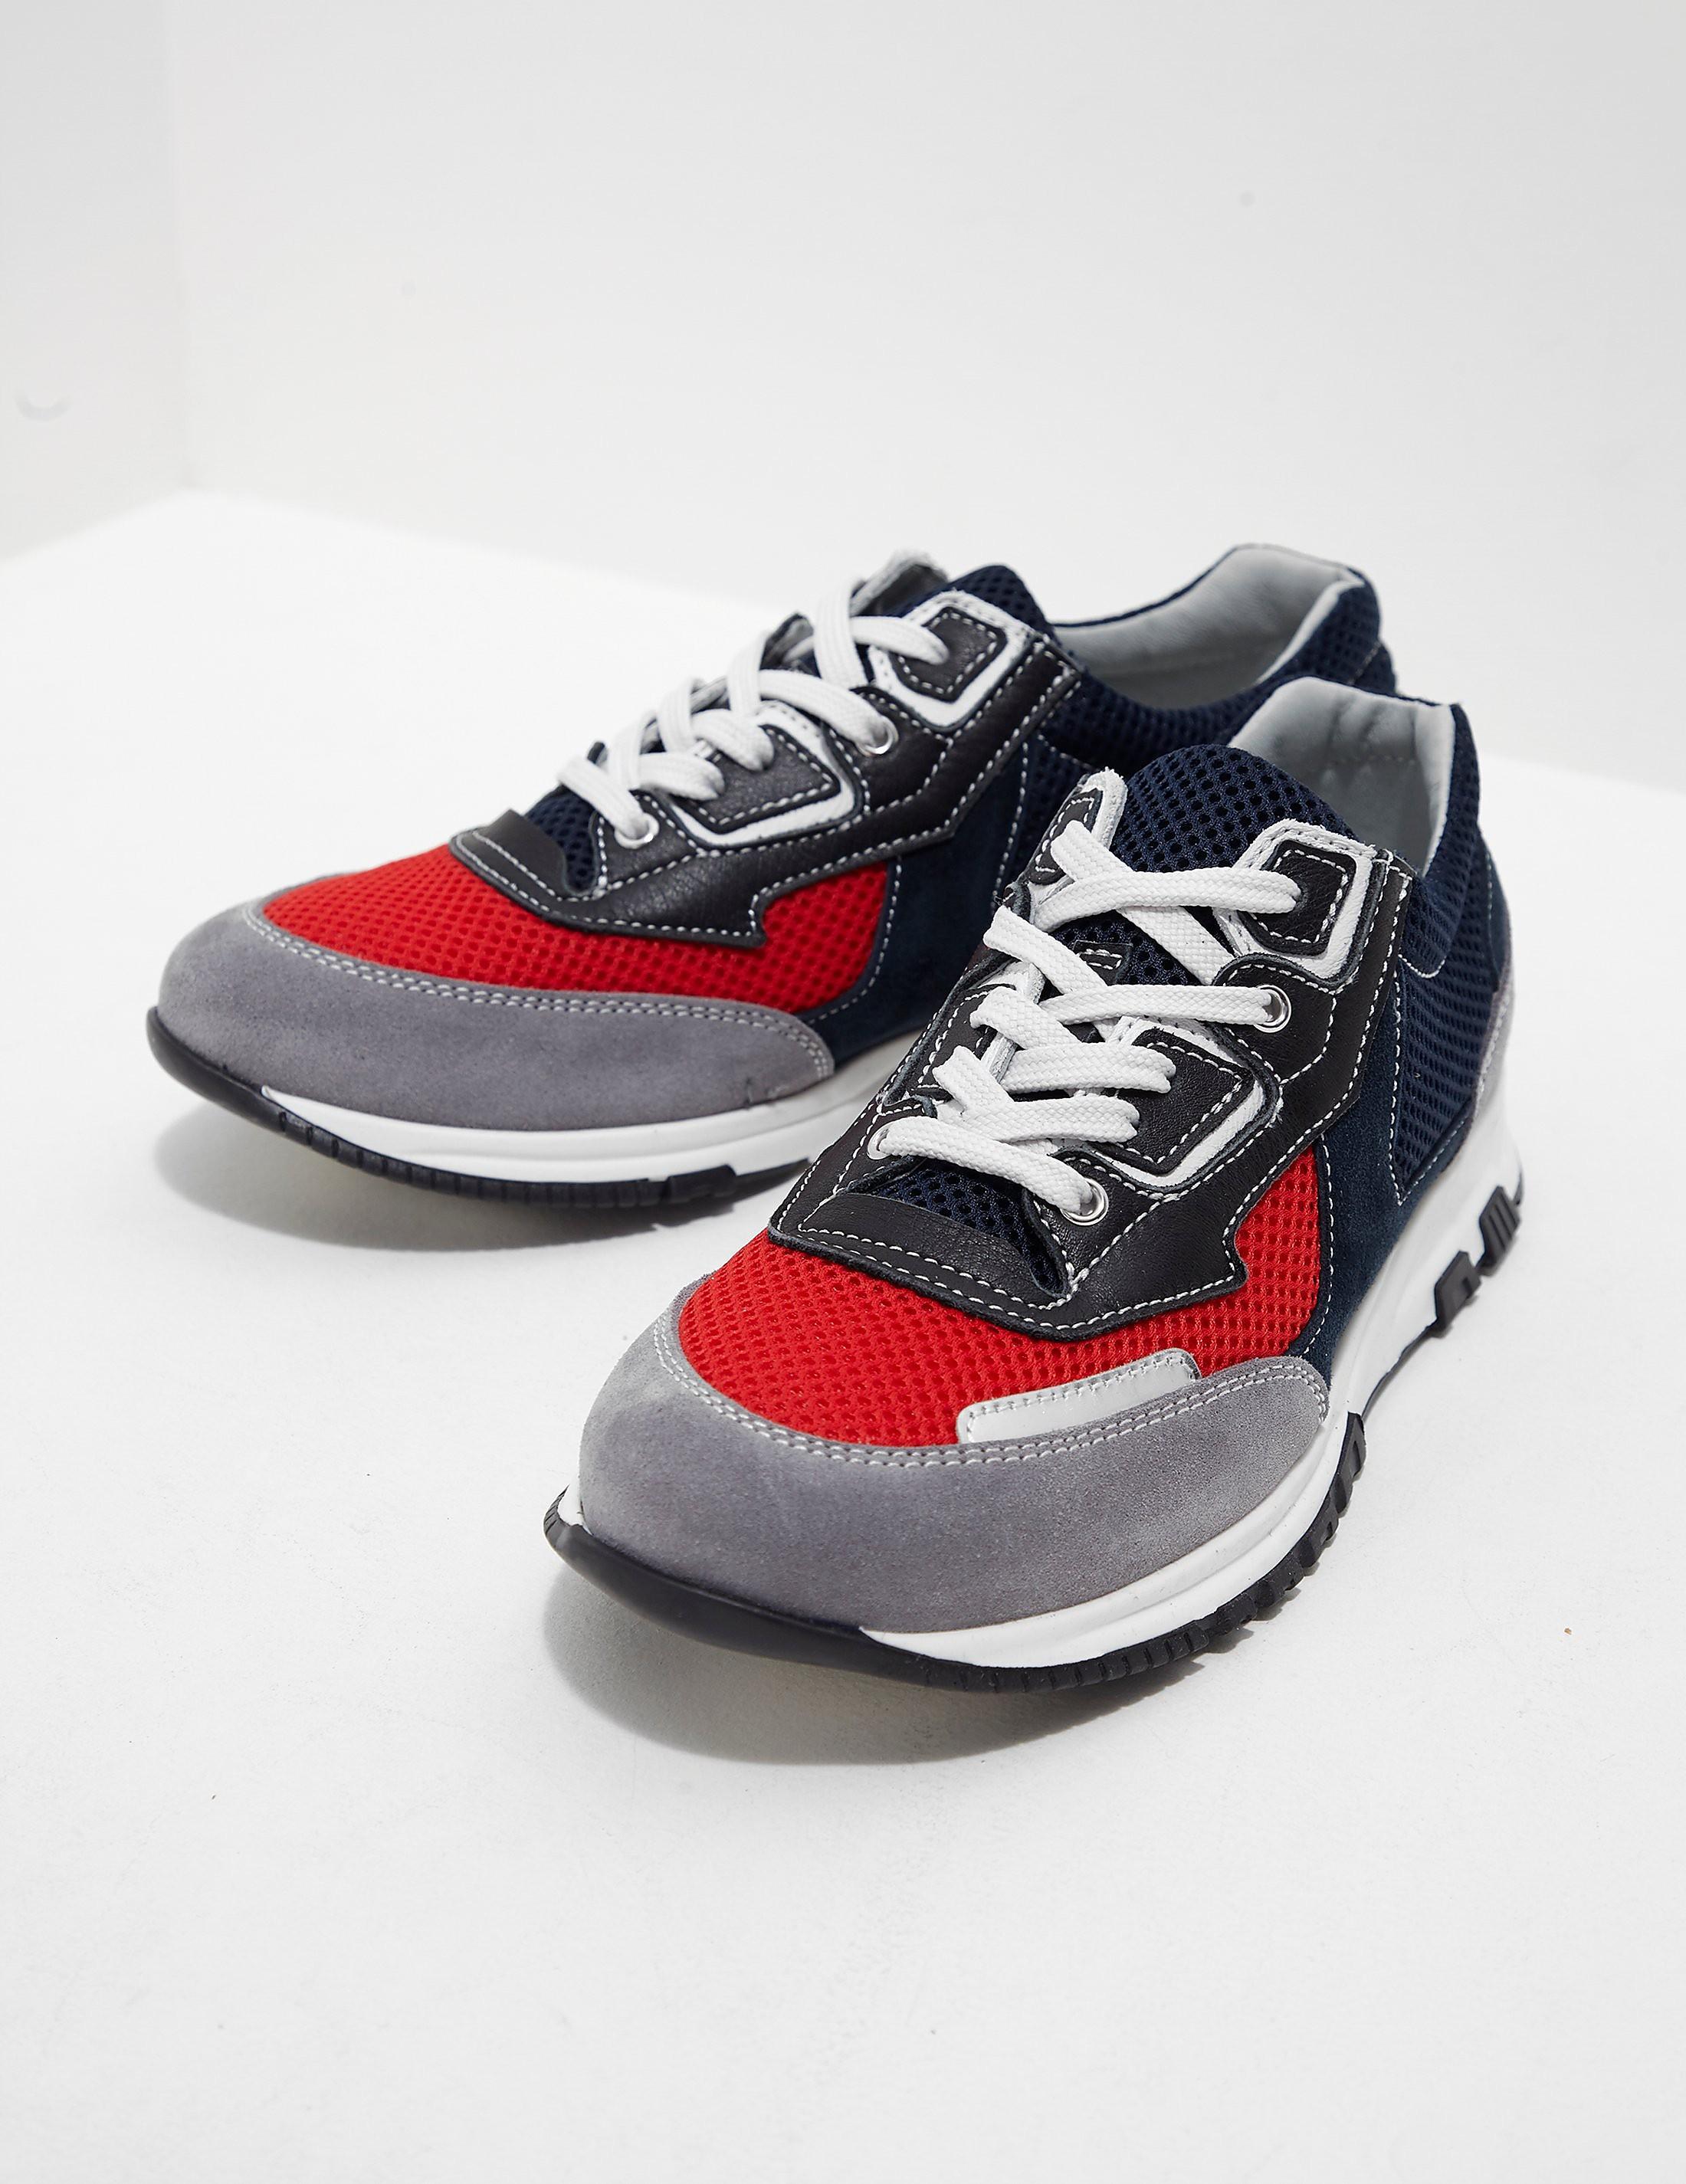 Lanvin Run Sneakers